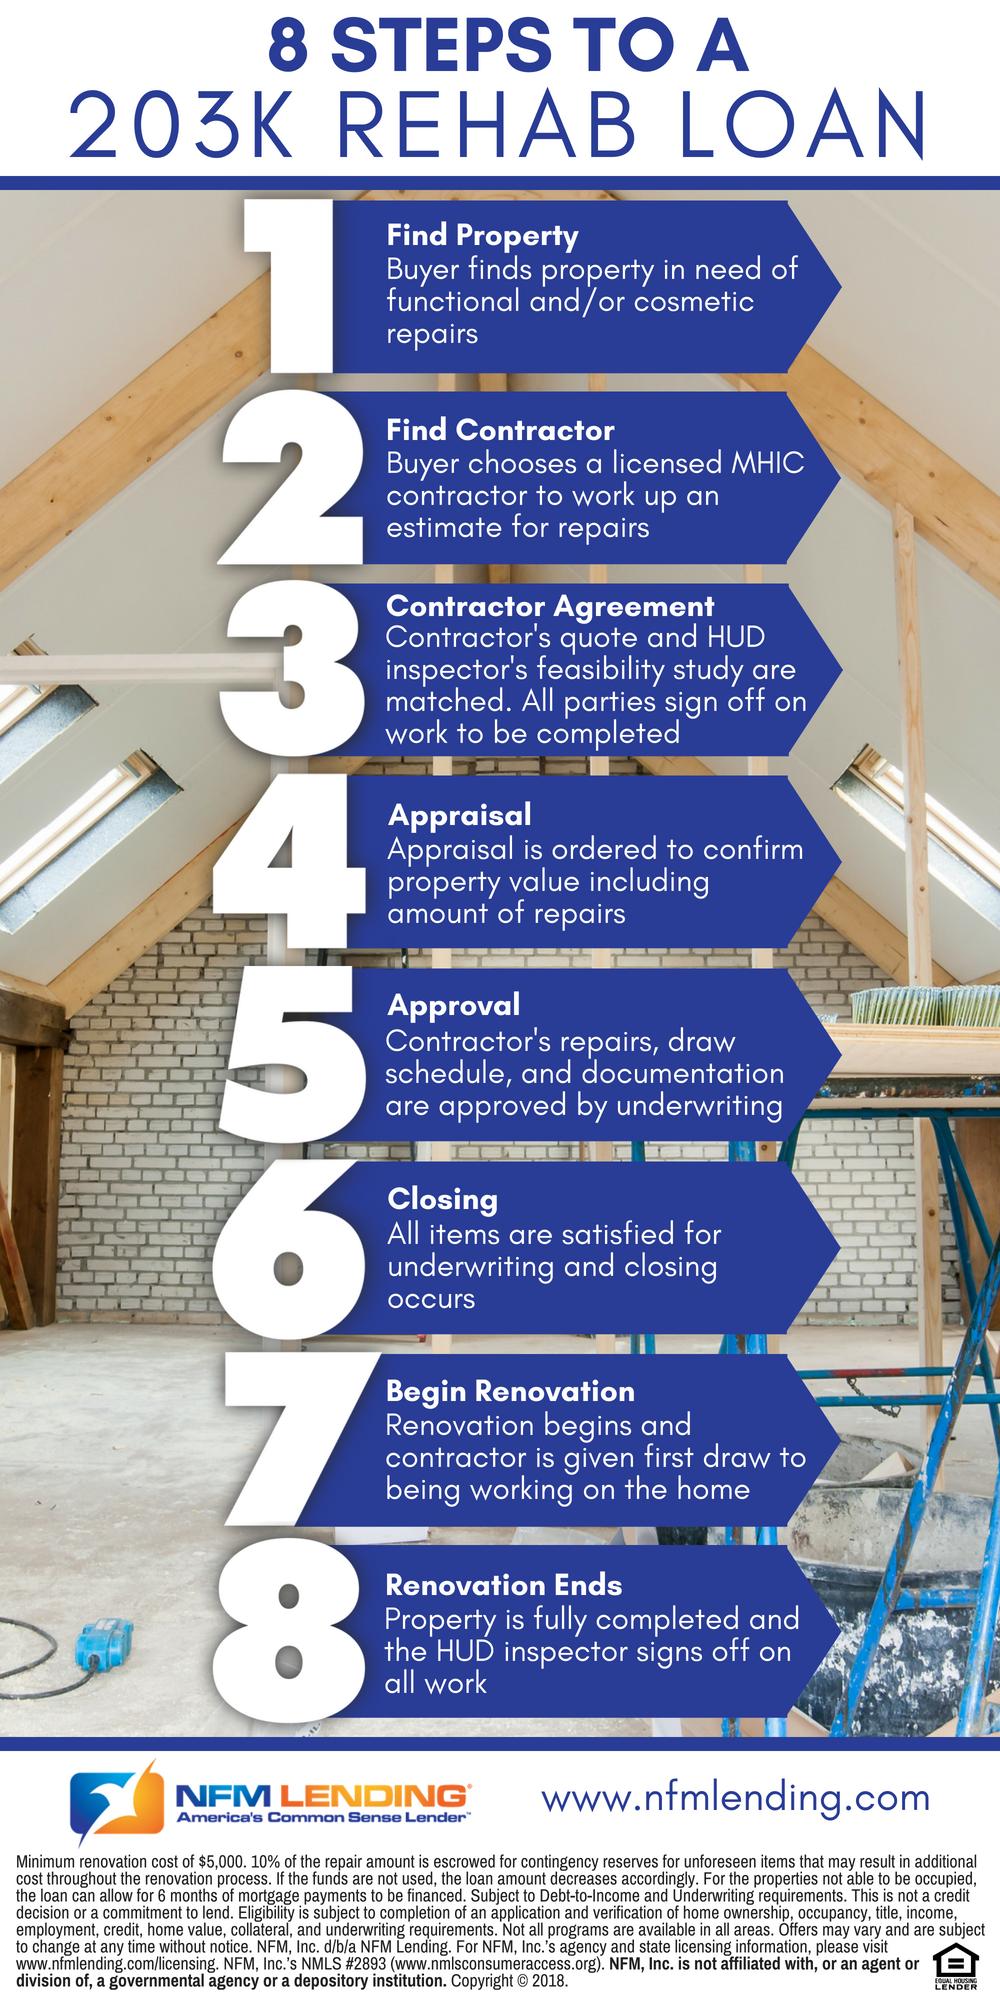 8 Steps To A 203k Rehab Loan Nfm Lending Home Improvement Loans Renovation Loans Remodeling Business